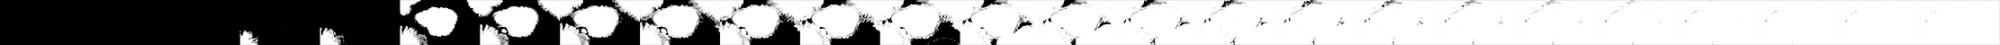 'Logo' from the web at 'http://www.inkrefuge.com/assets/images/on_page_element/ink.png'